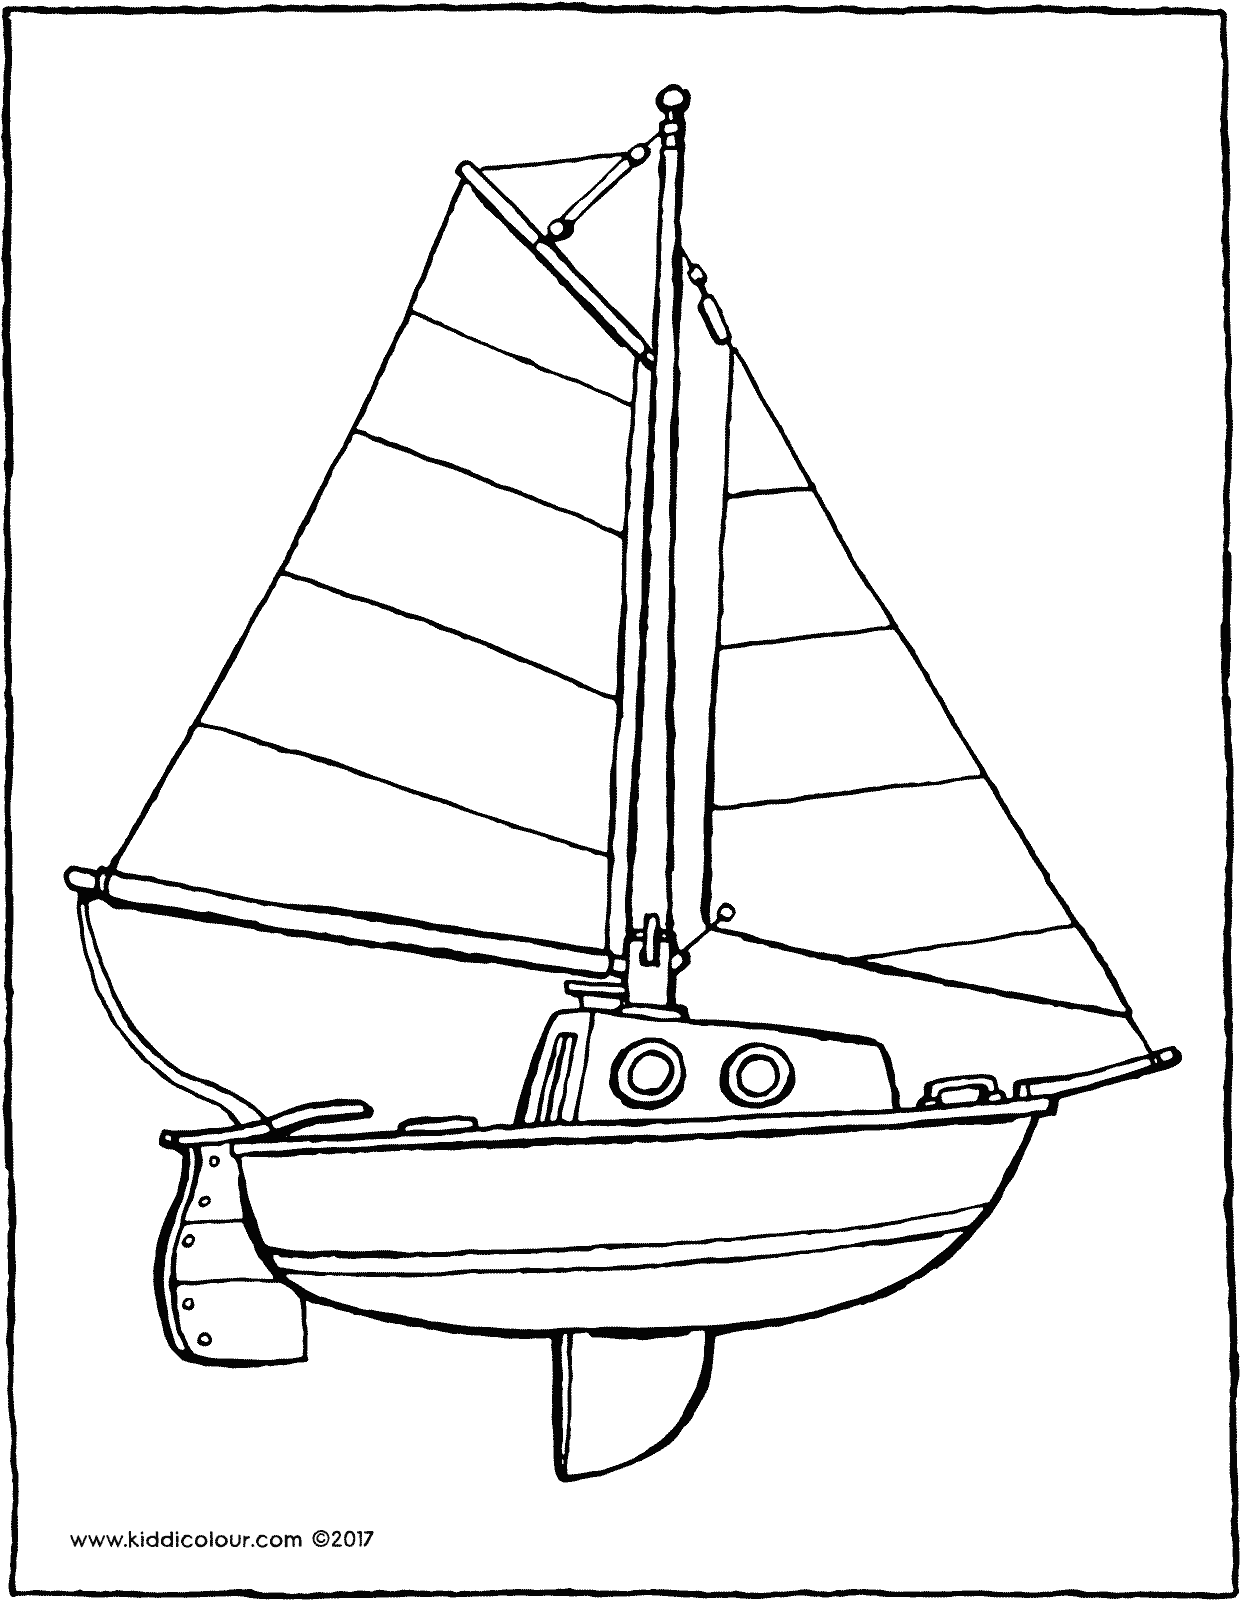 1240x1600 Sailboat